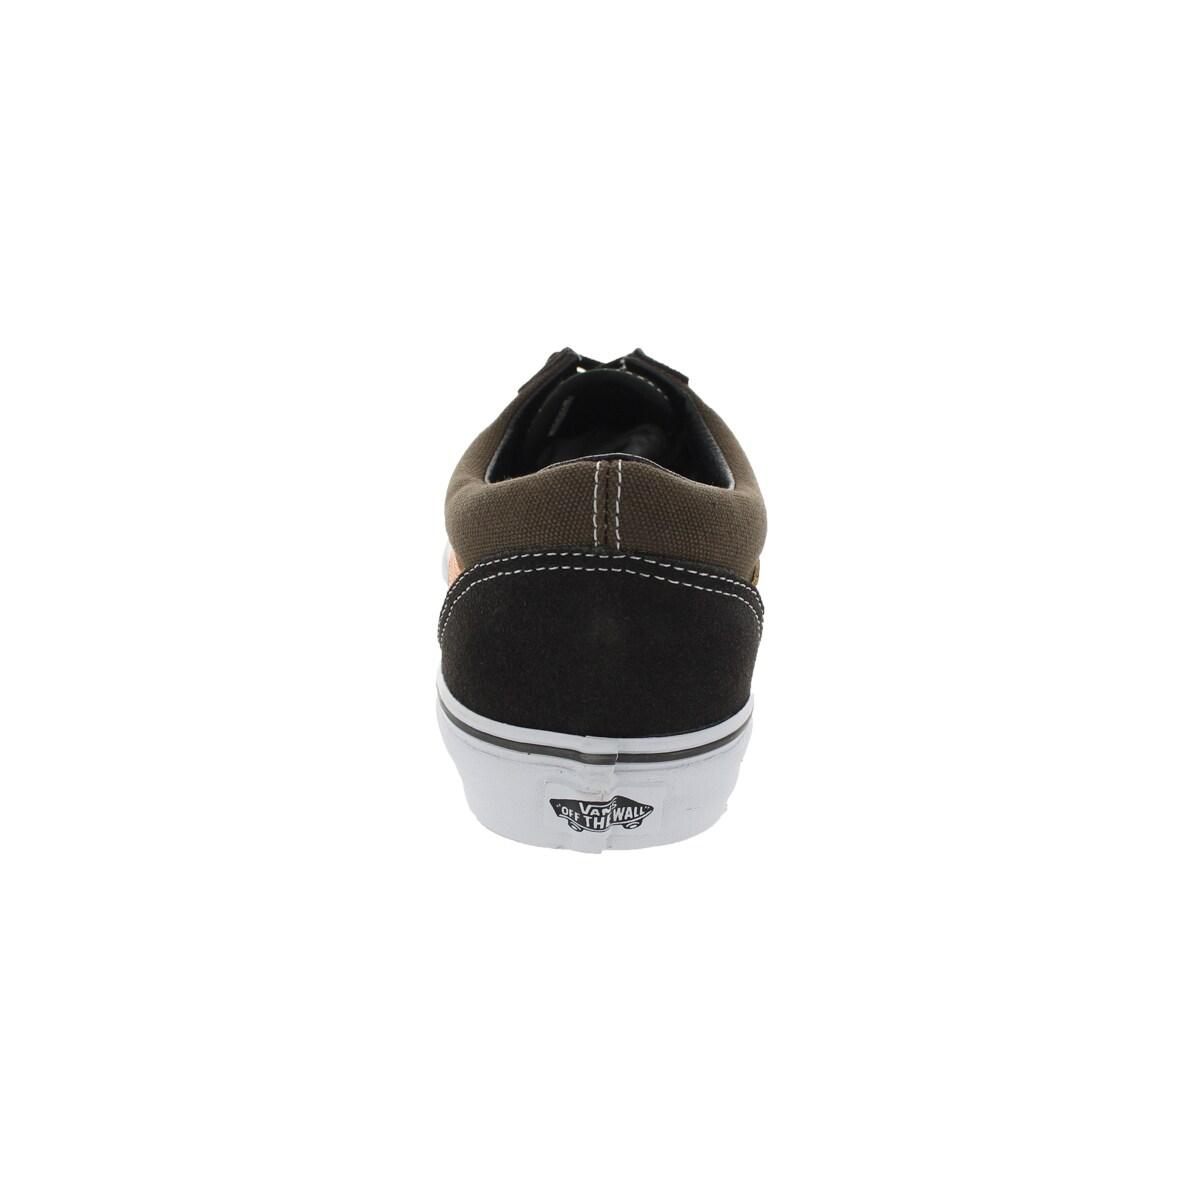 8789dd8507f8e4 Shop Vans Unisex Old Skool Brown Olive Orange Canvas Skate Shoes - Free  Shipping Today - Overstock - 12115244